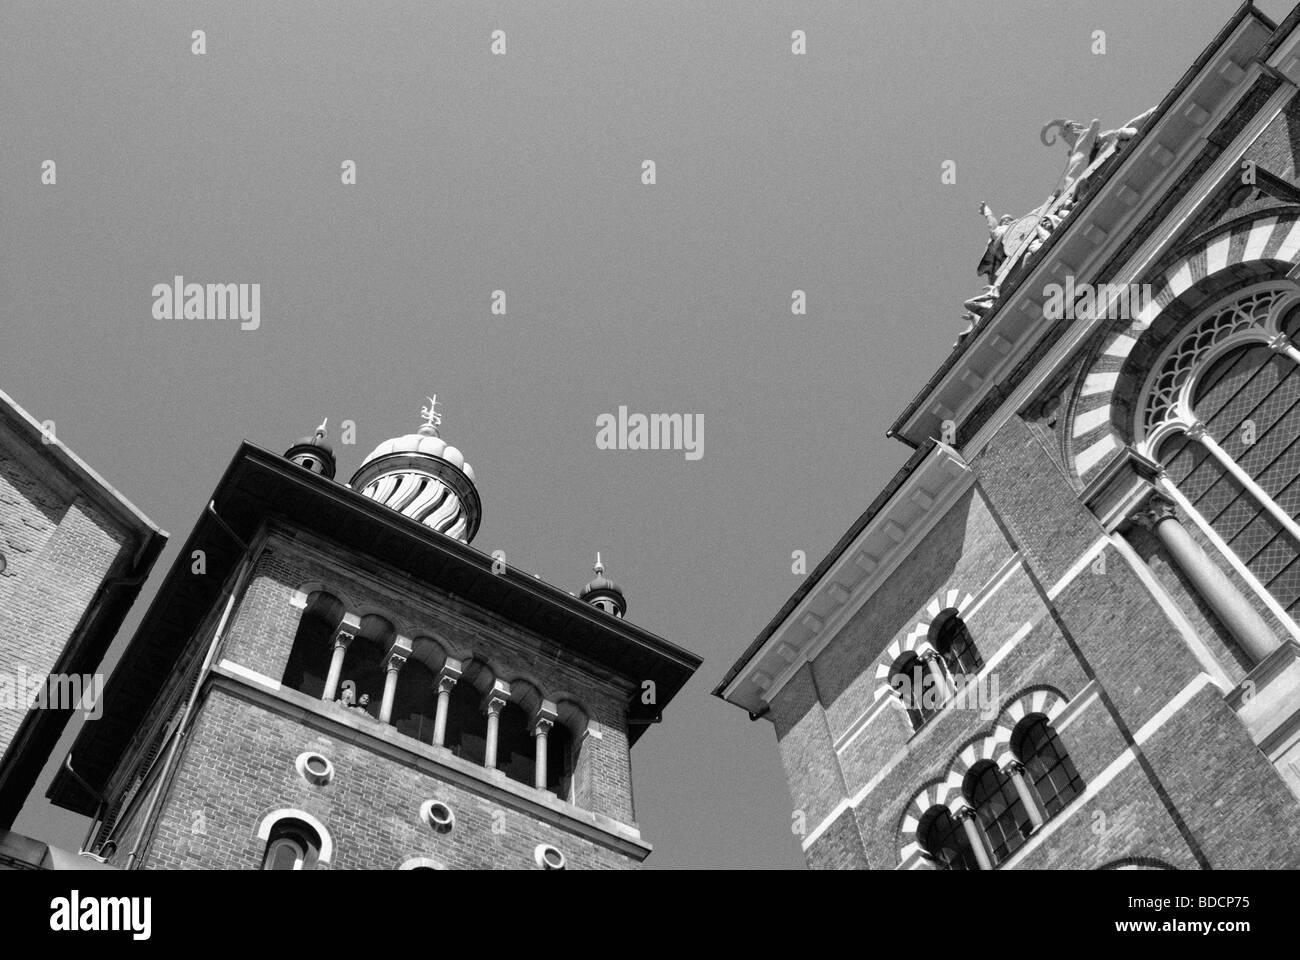 Carlsberg Black and White Stock Photos & Images - Alamy